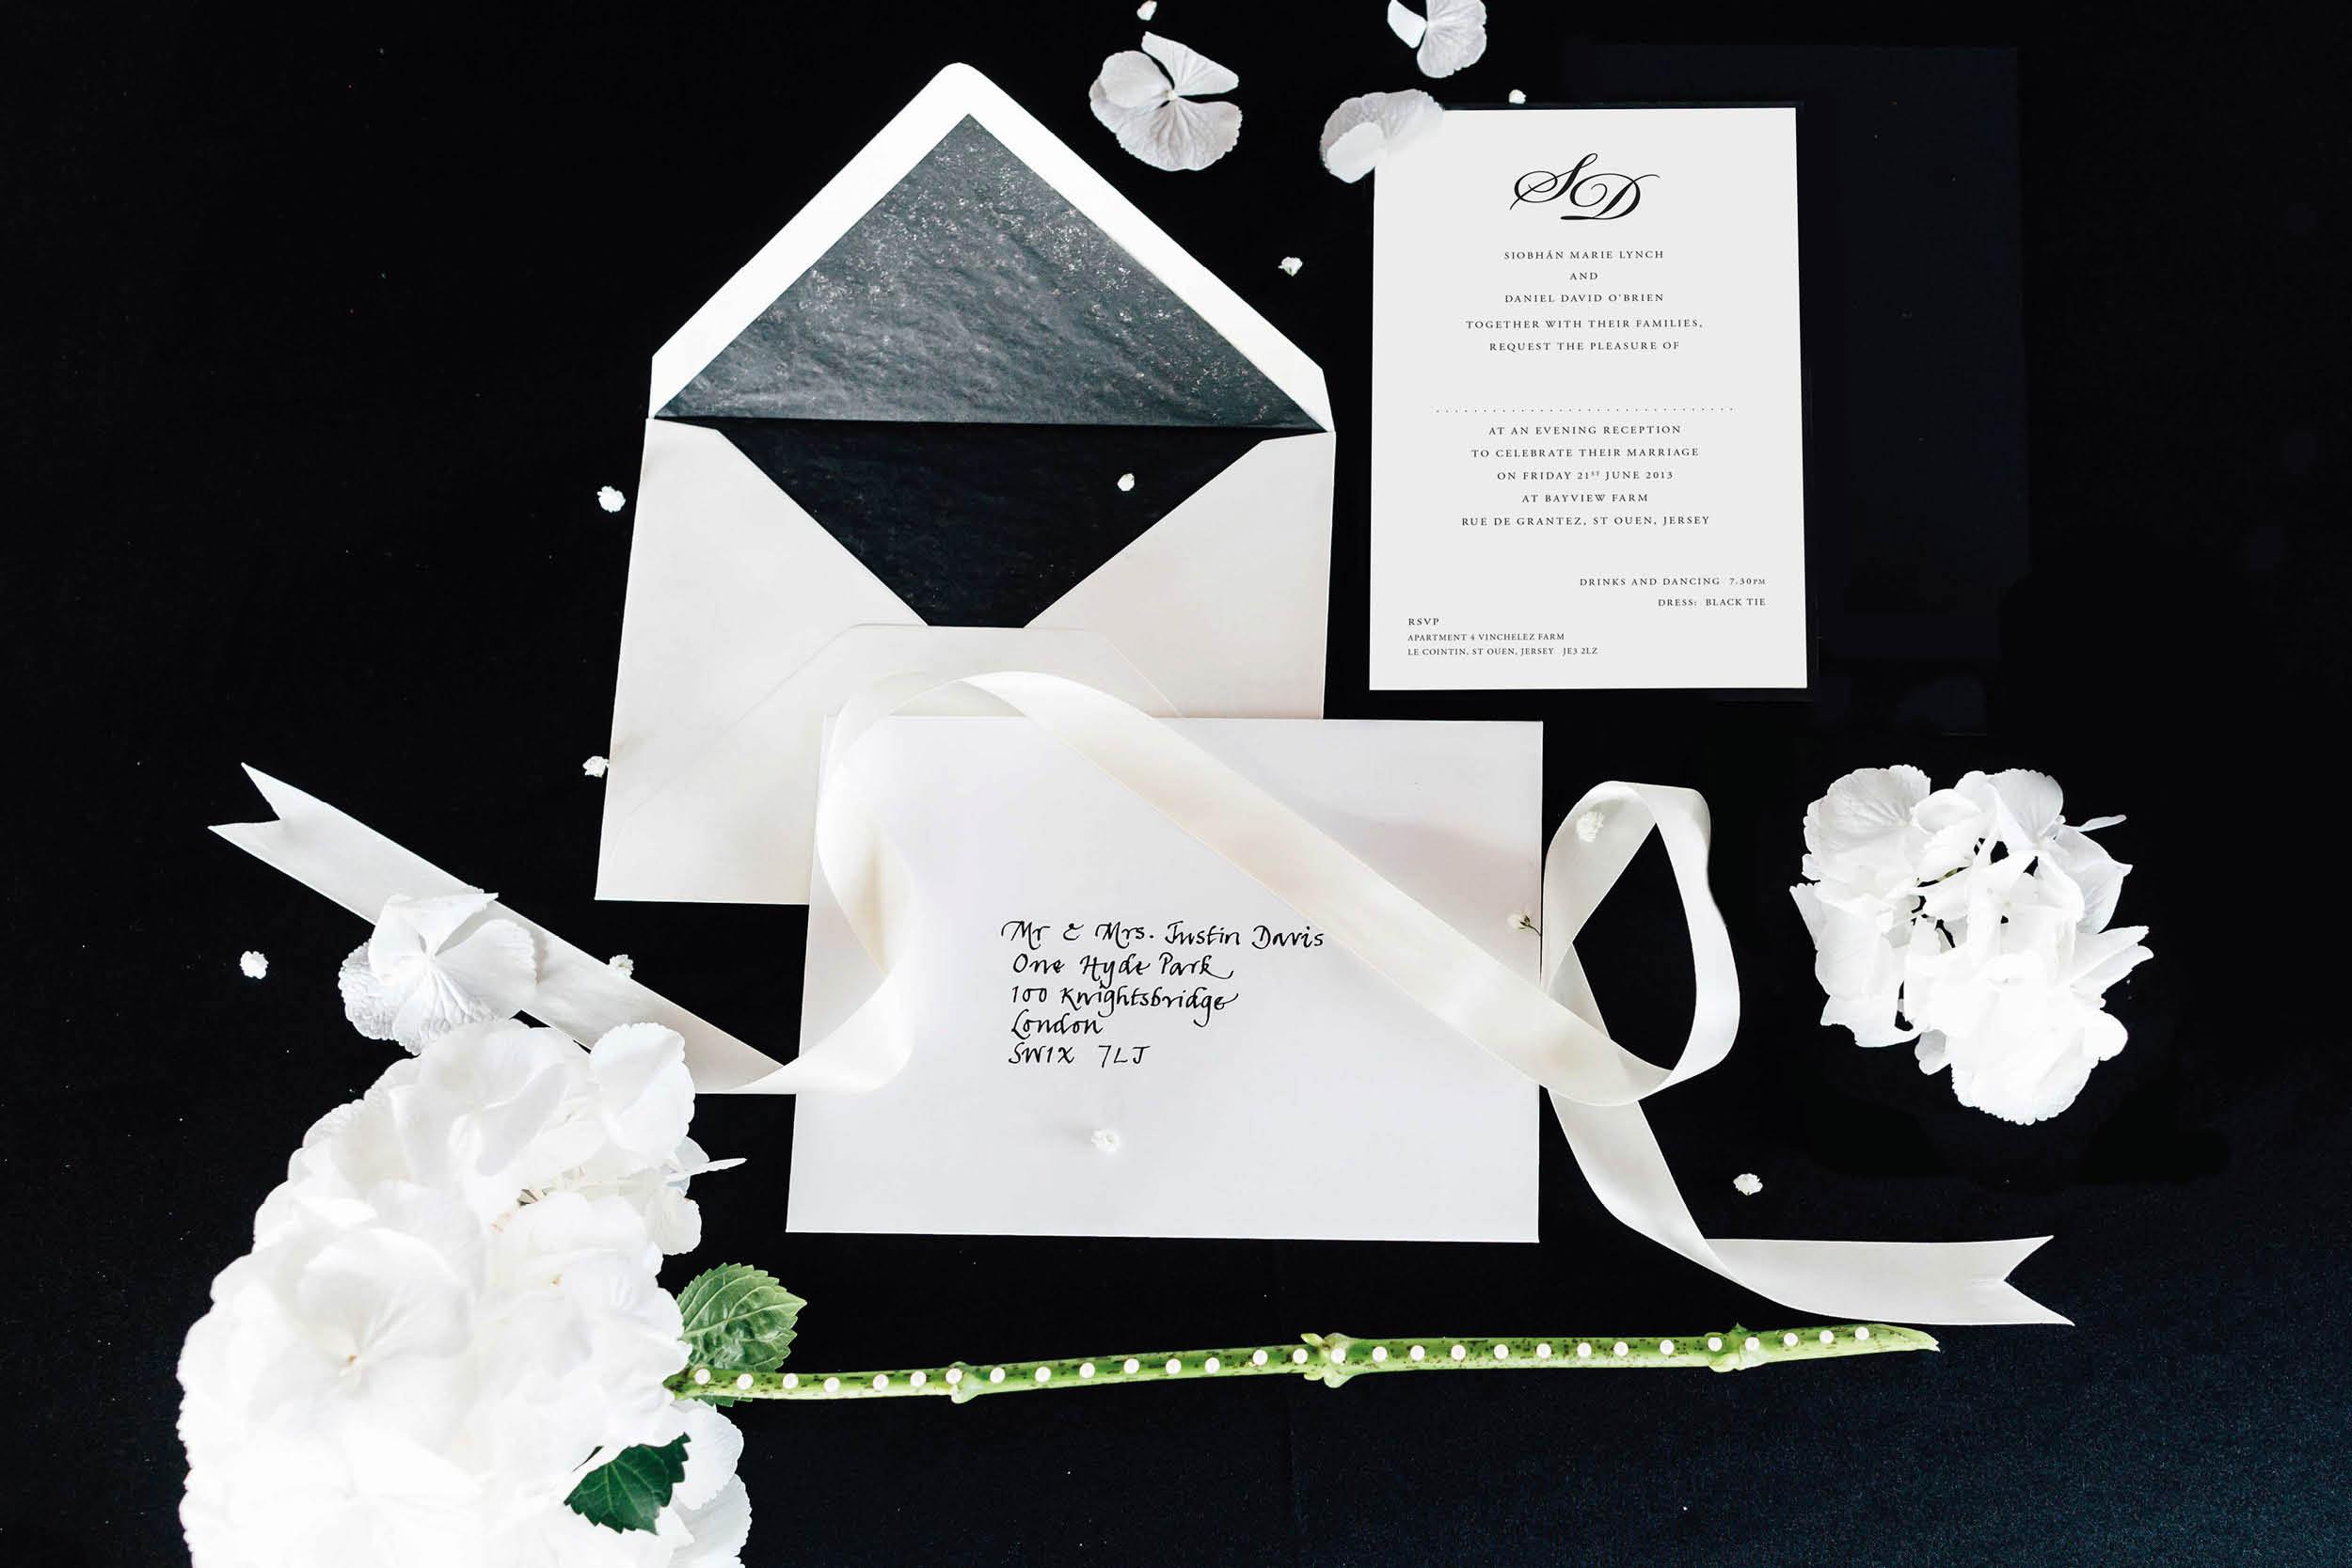 Monochrome_monogram evening wedding reception invitation_ananyacards.com.jpg